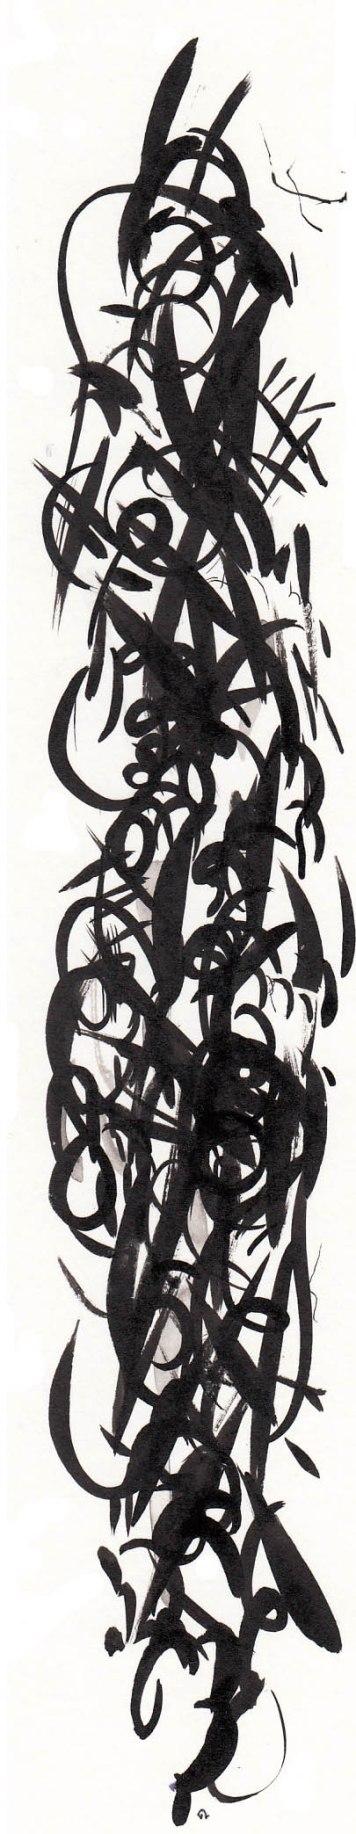 abstraction mai2